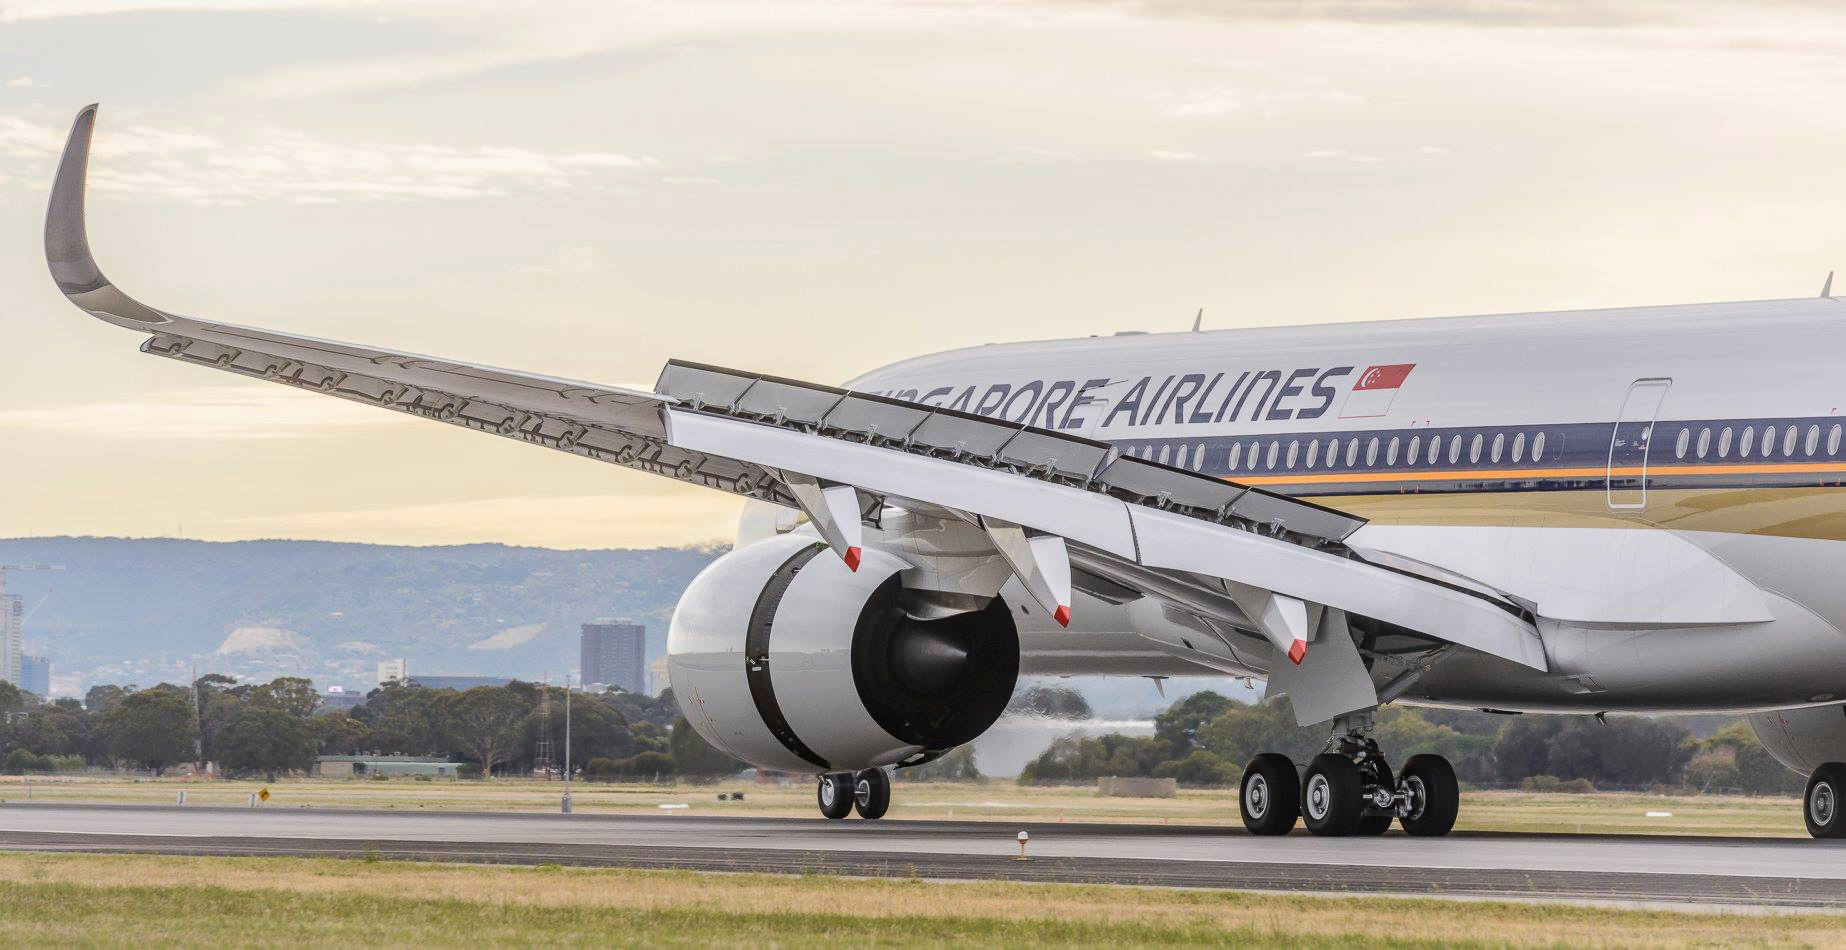 SIA Fleet: Airbus A350-900 Regional – Mainly Miles